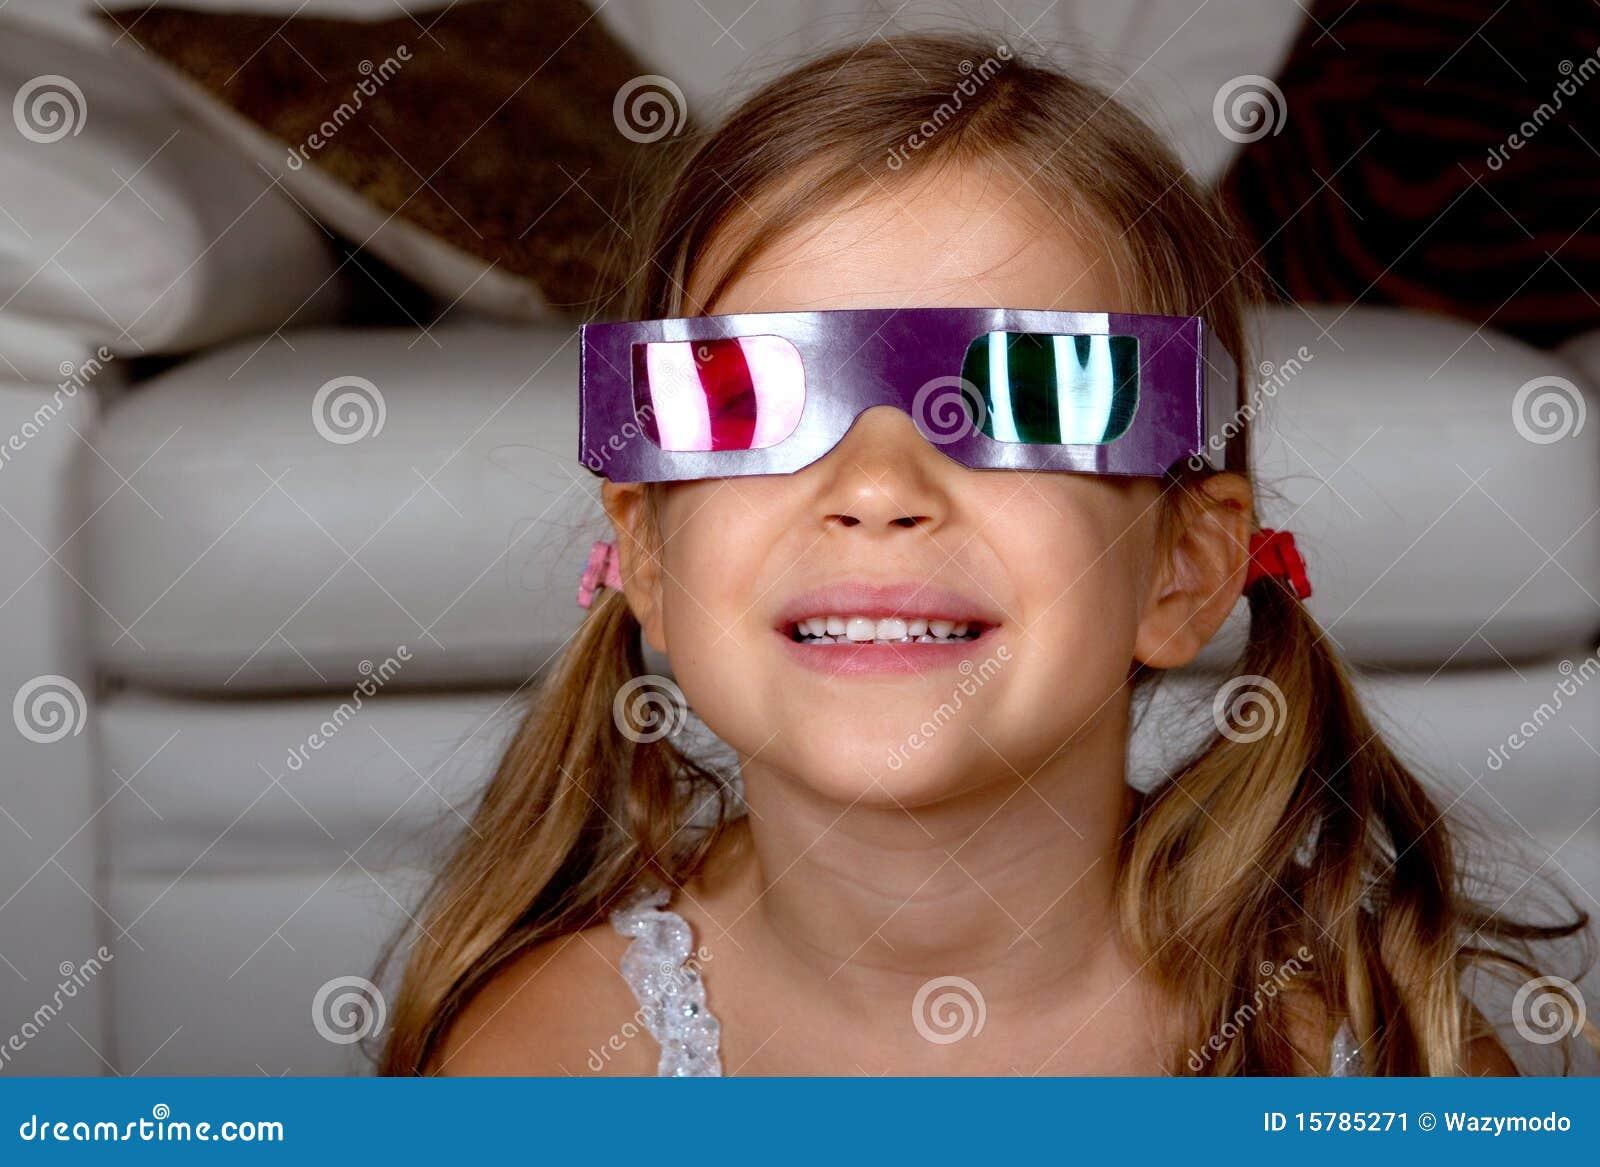 Girl Wearing 3D Glasses Stock Image - Image: 15785271